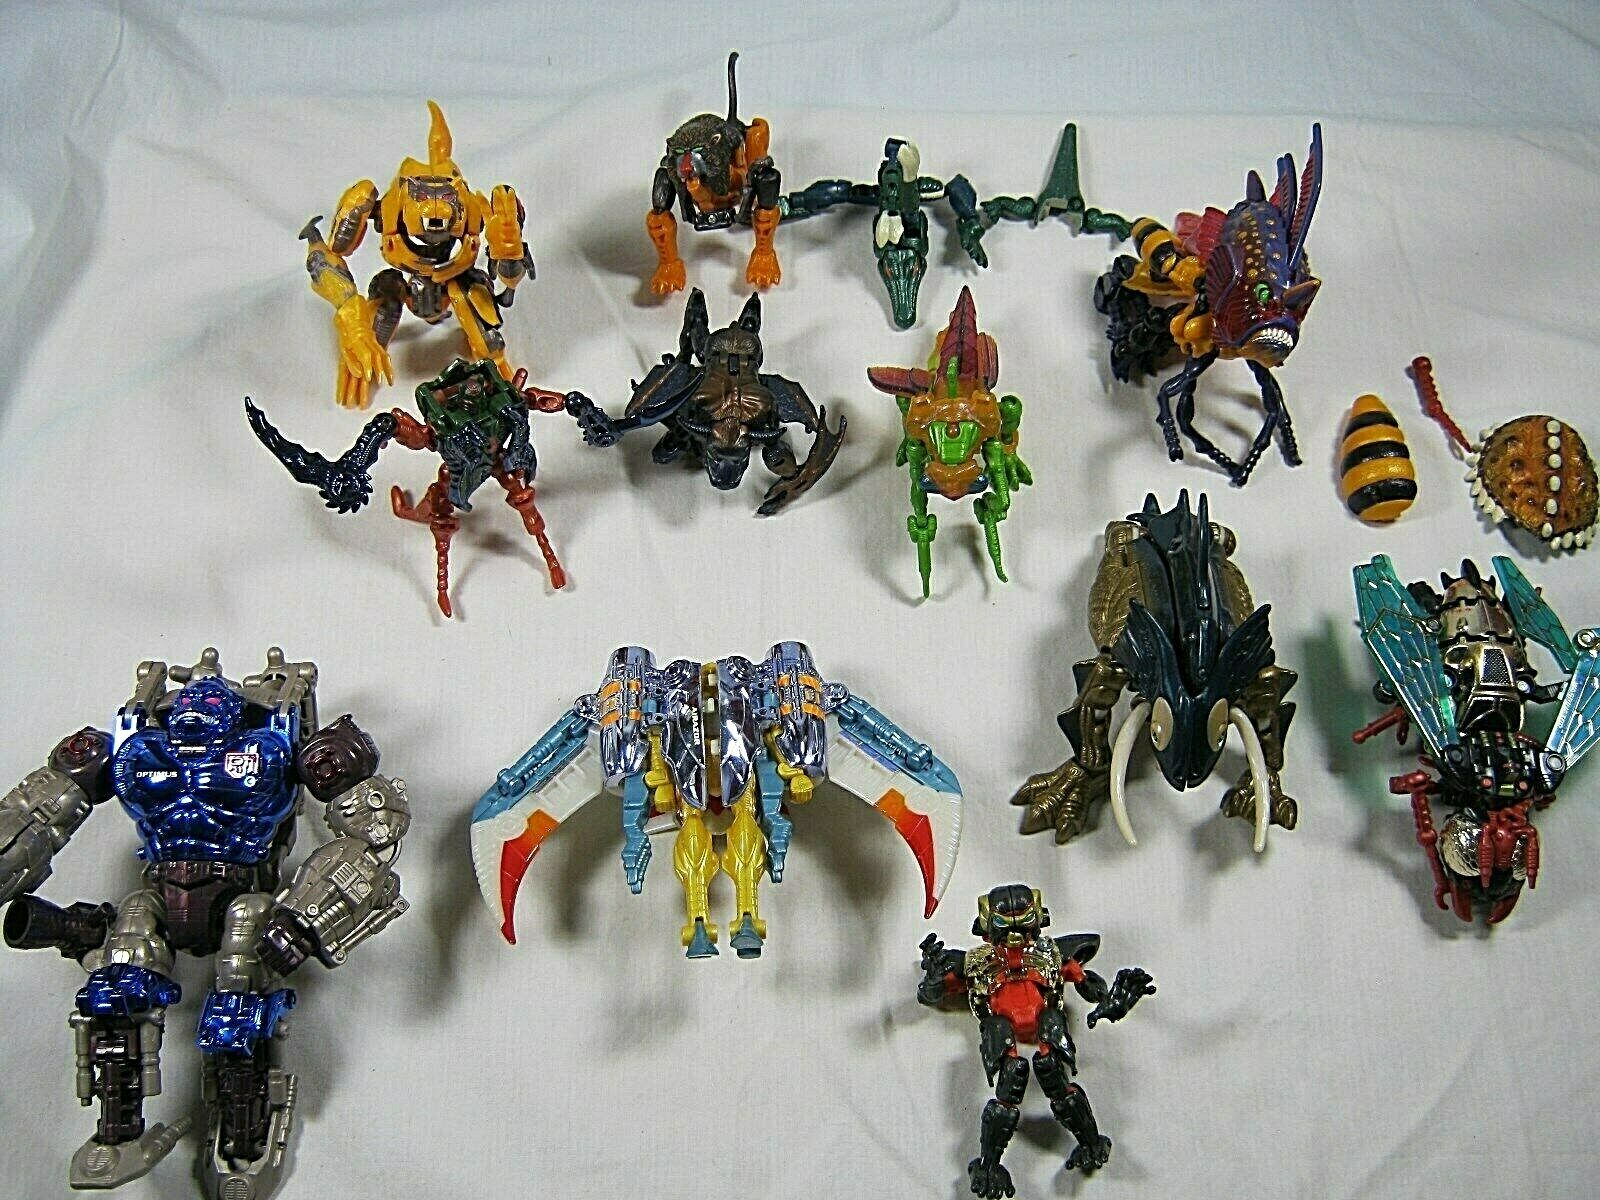 Hasbro (Takara) Tramformers Action Figures Assortment of 15 Pieces, Parts. (K)